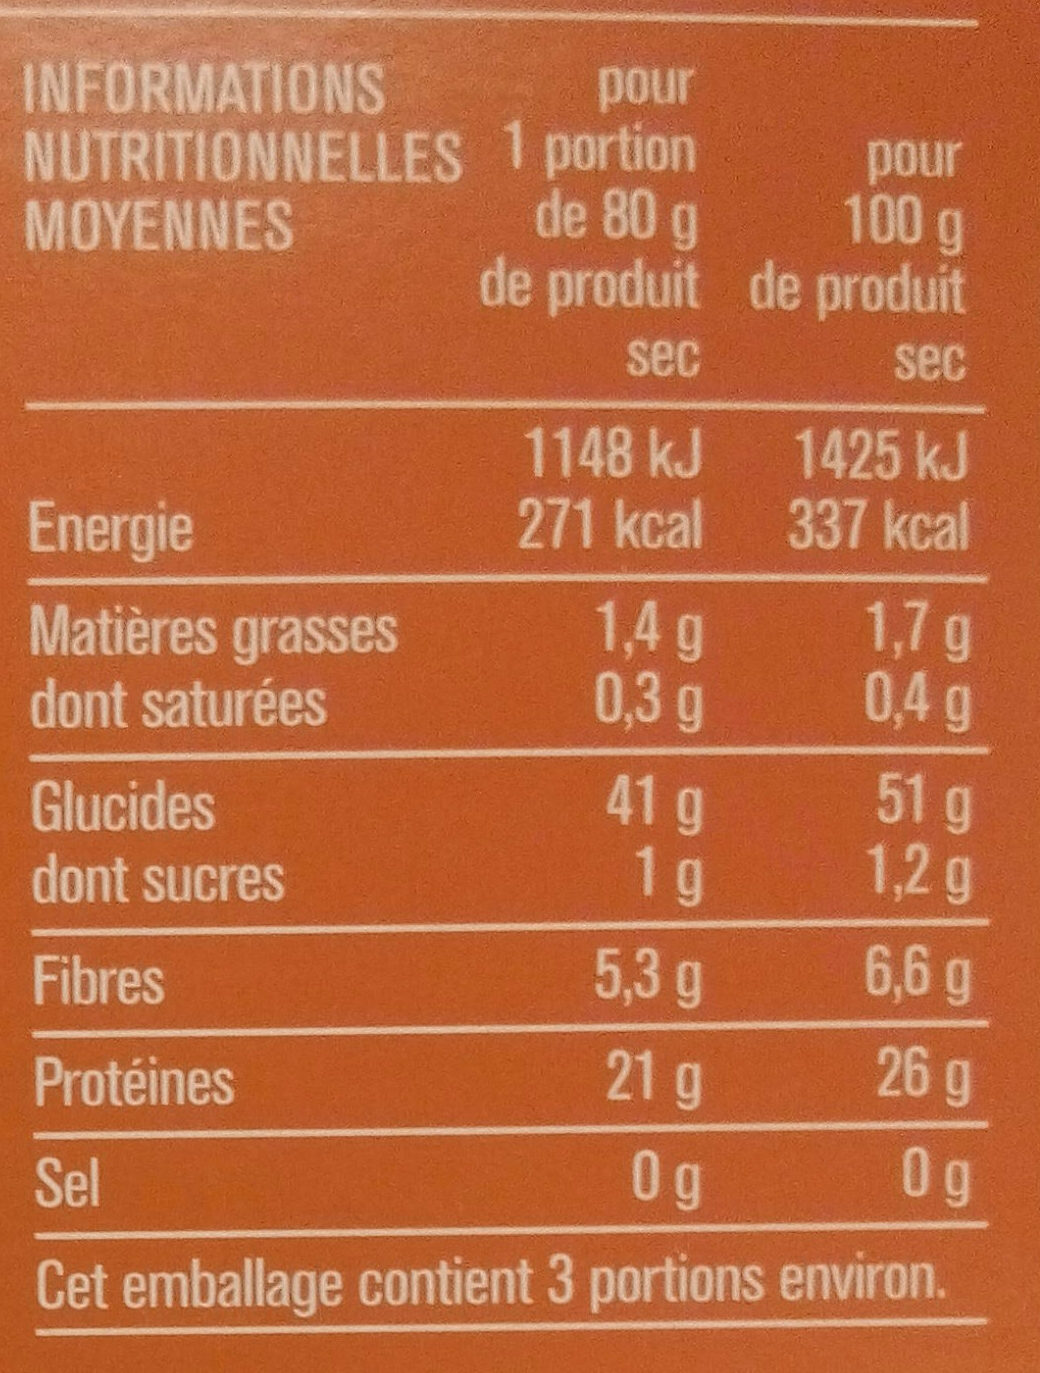 Penne de lentilles corail - Voedingswaarden - fr